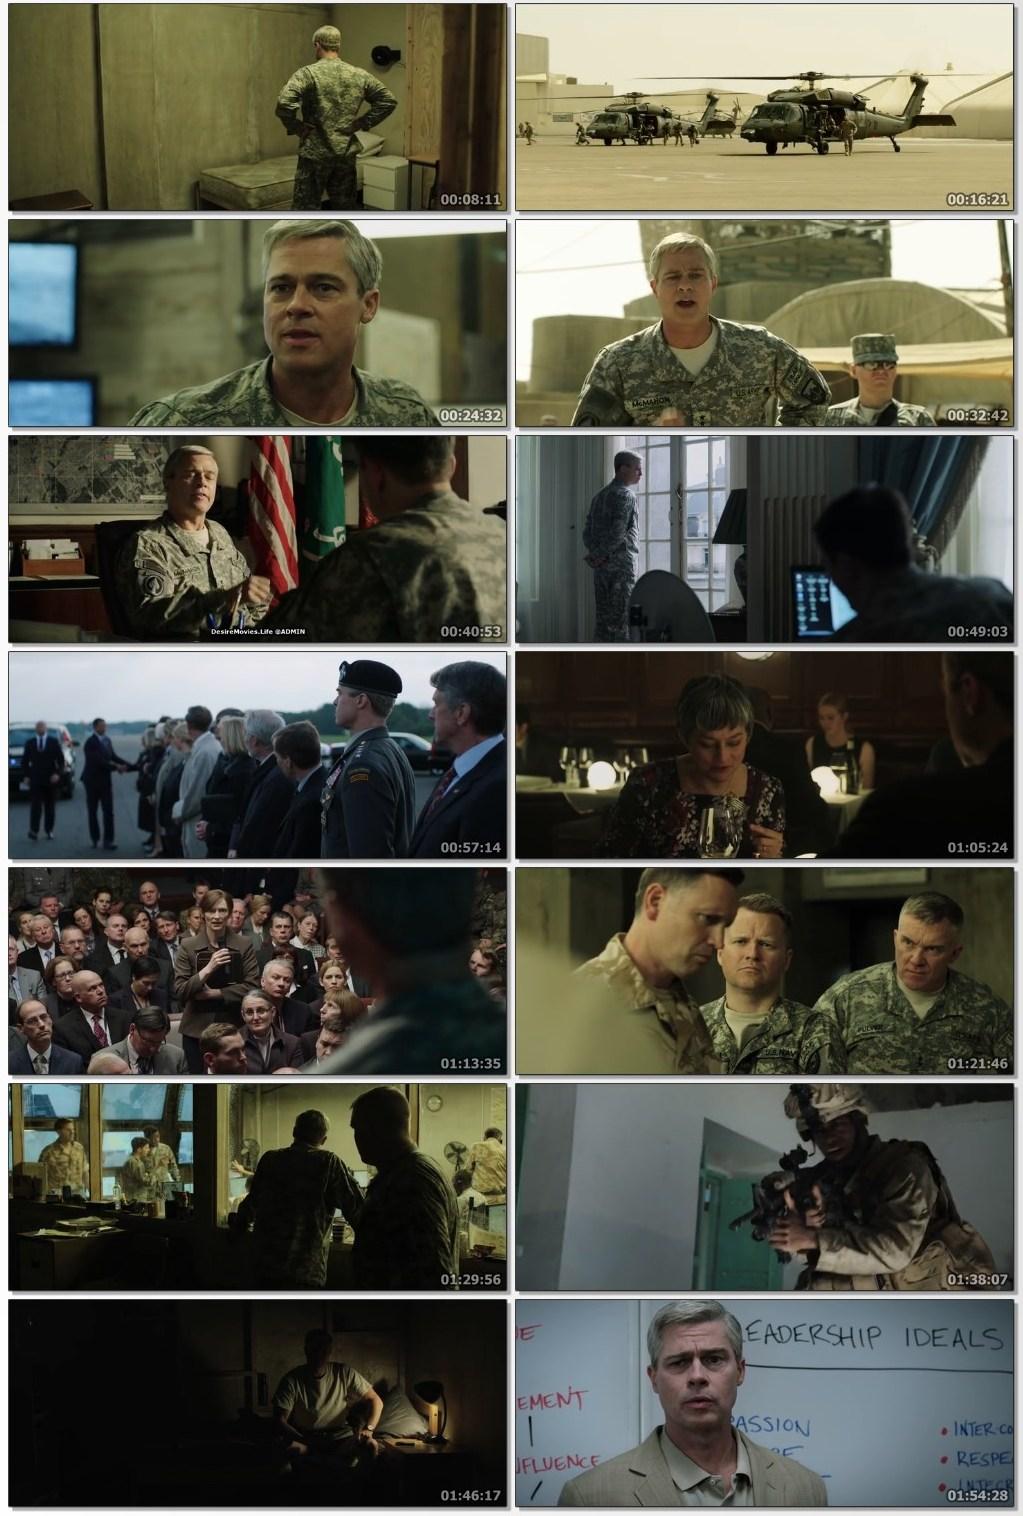 war machine movie download in hindi 300mb, war machine movie download in hindi 480p, war machine movie download free, war machine movie download in hindi 720p